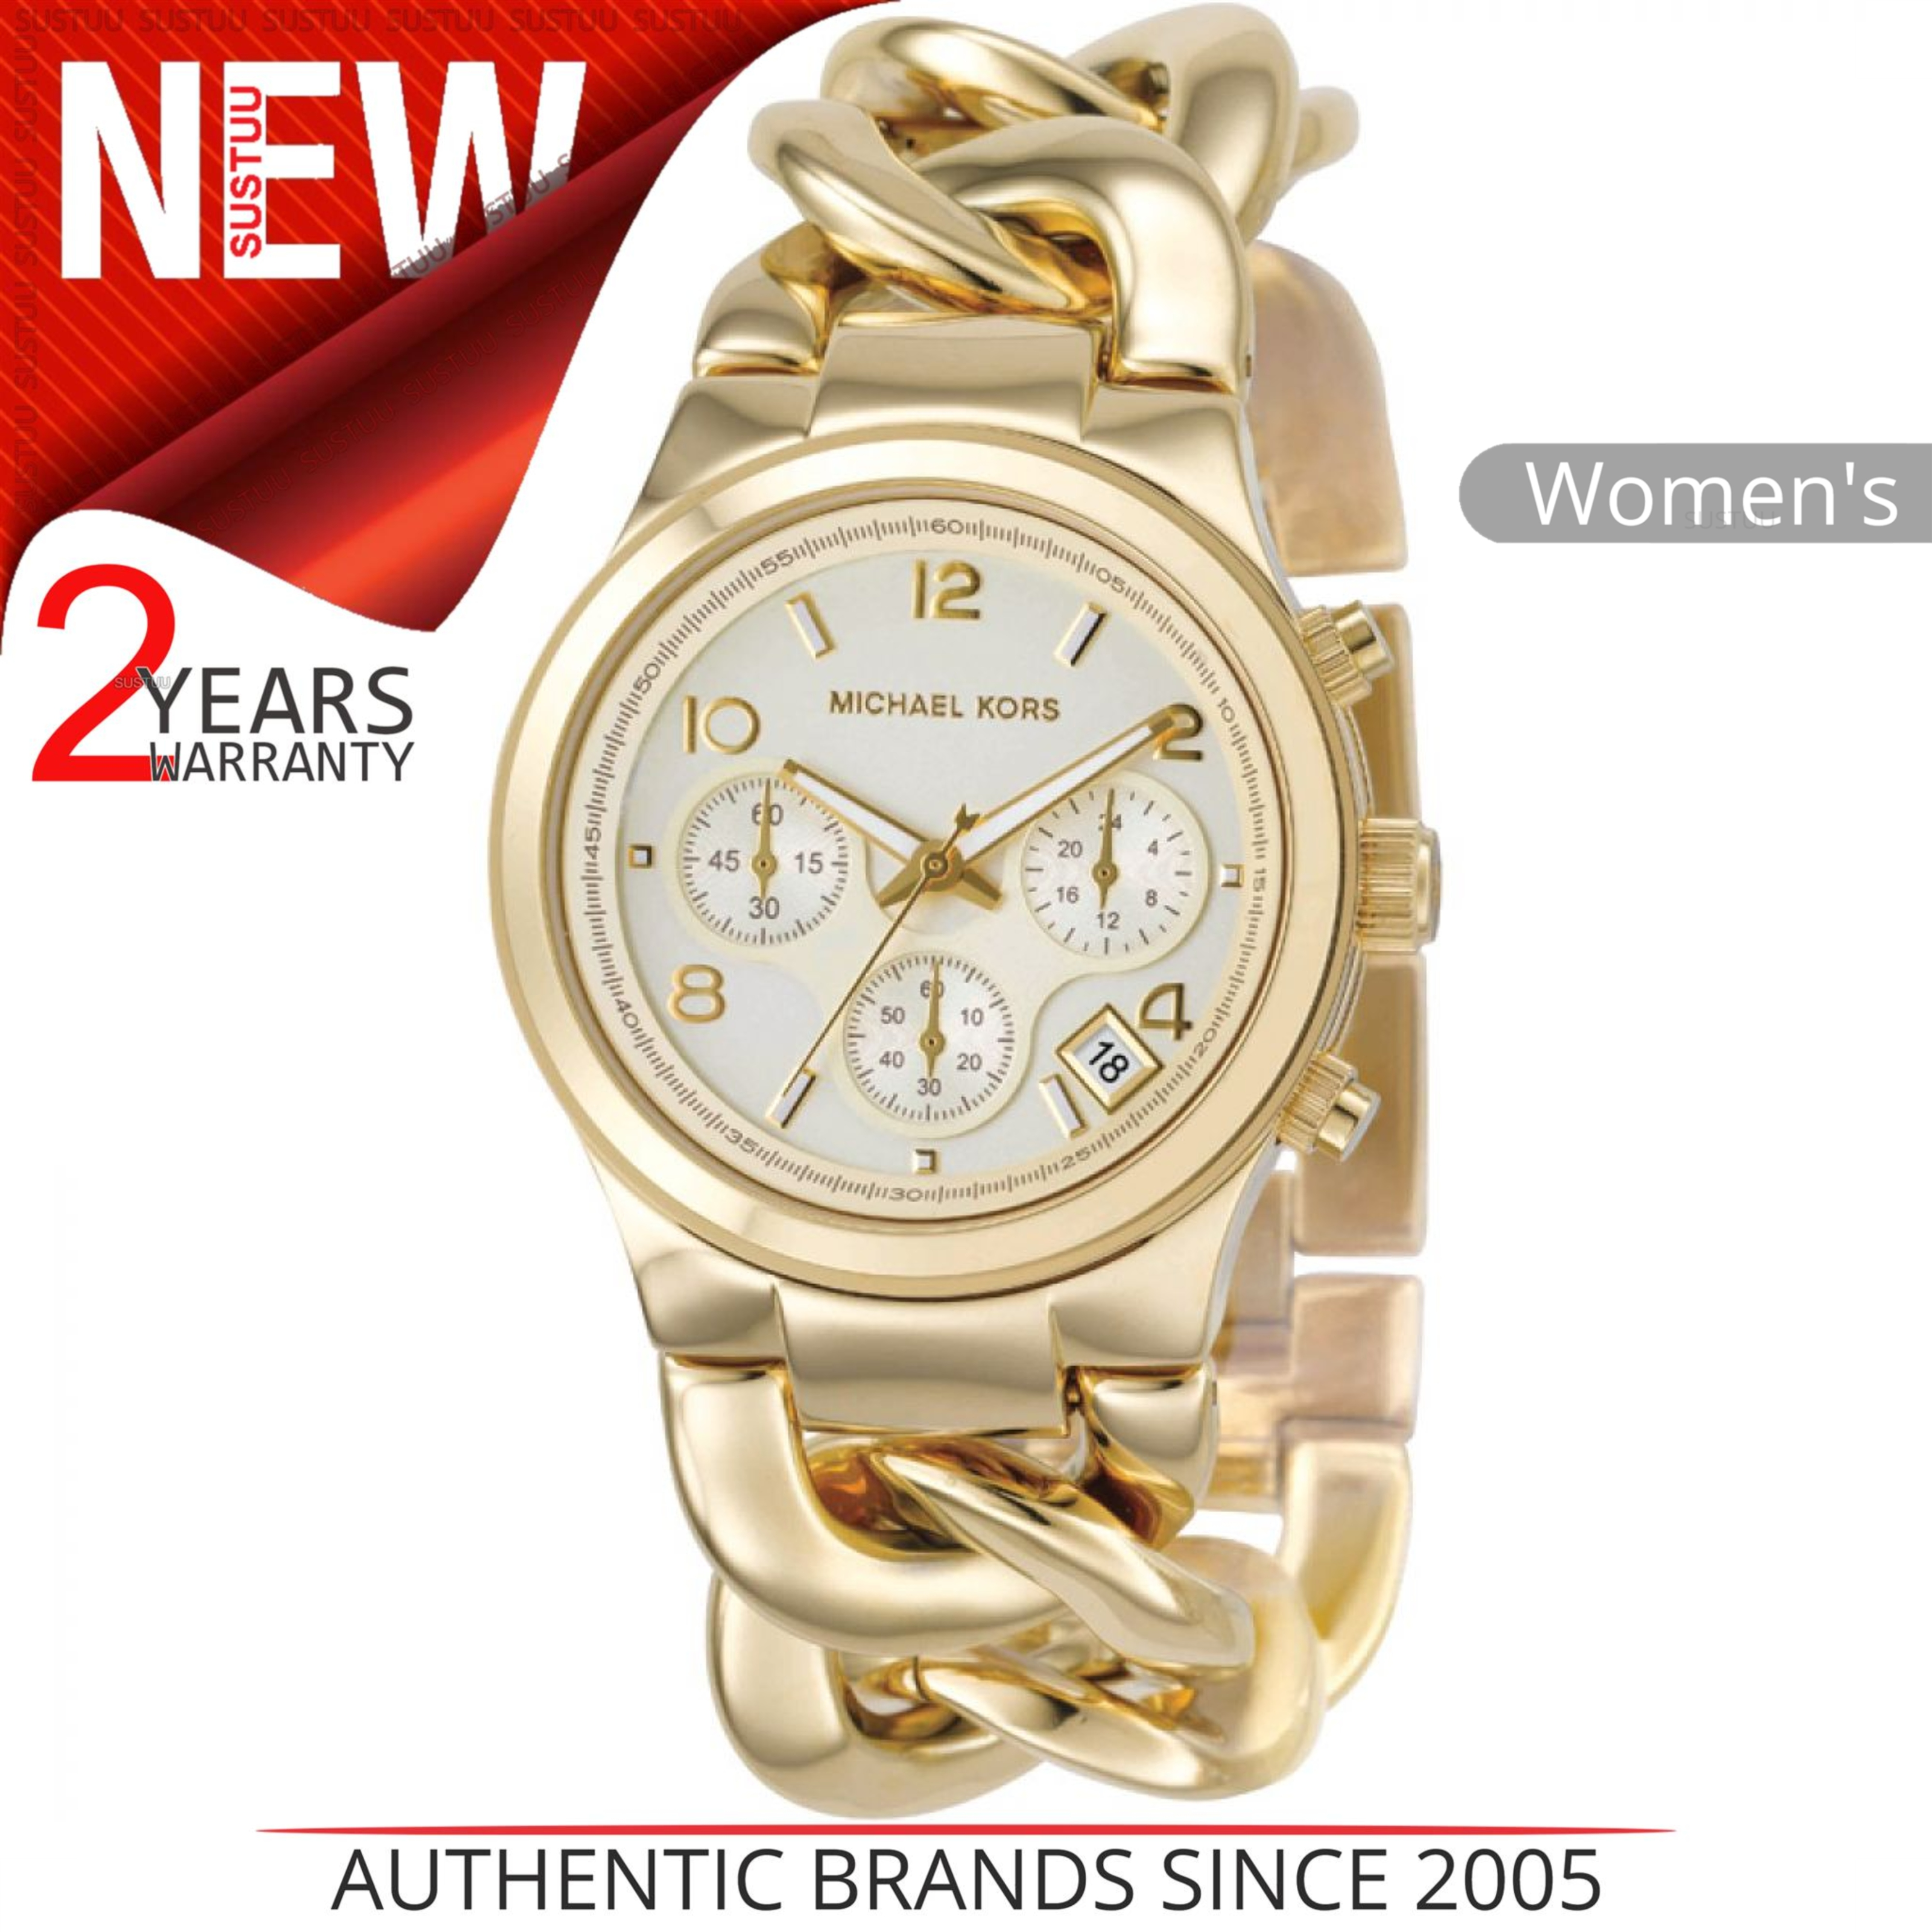 a79a0c0be1ed2 Details about Michael Kors Runway ladies Watch│Chronograph Dial│Gold Tone  Twist Bracelet│3131